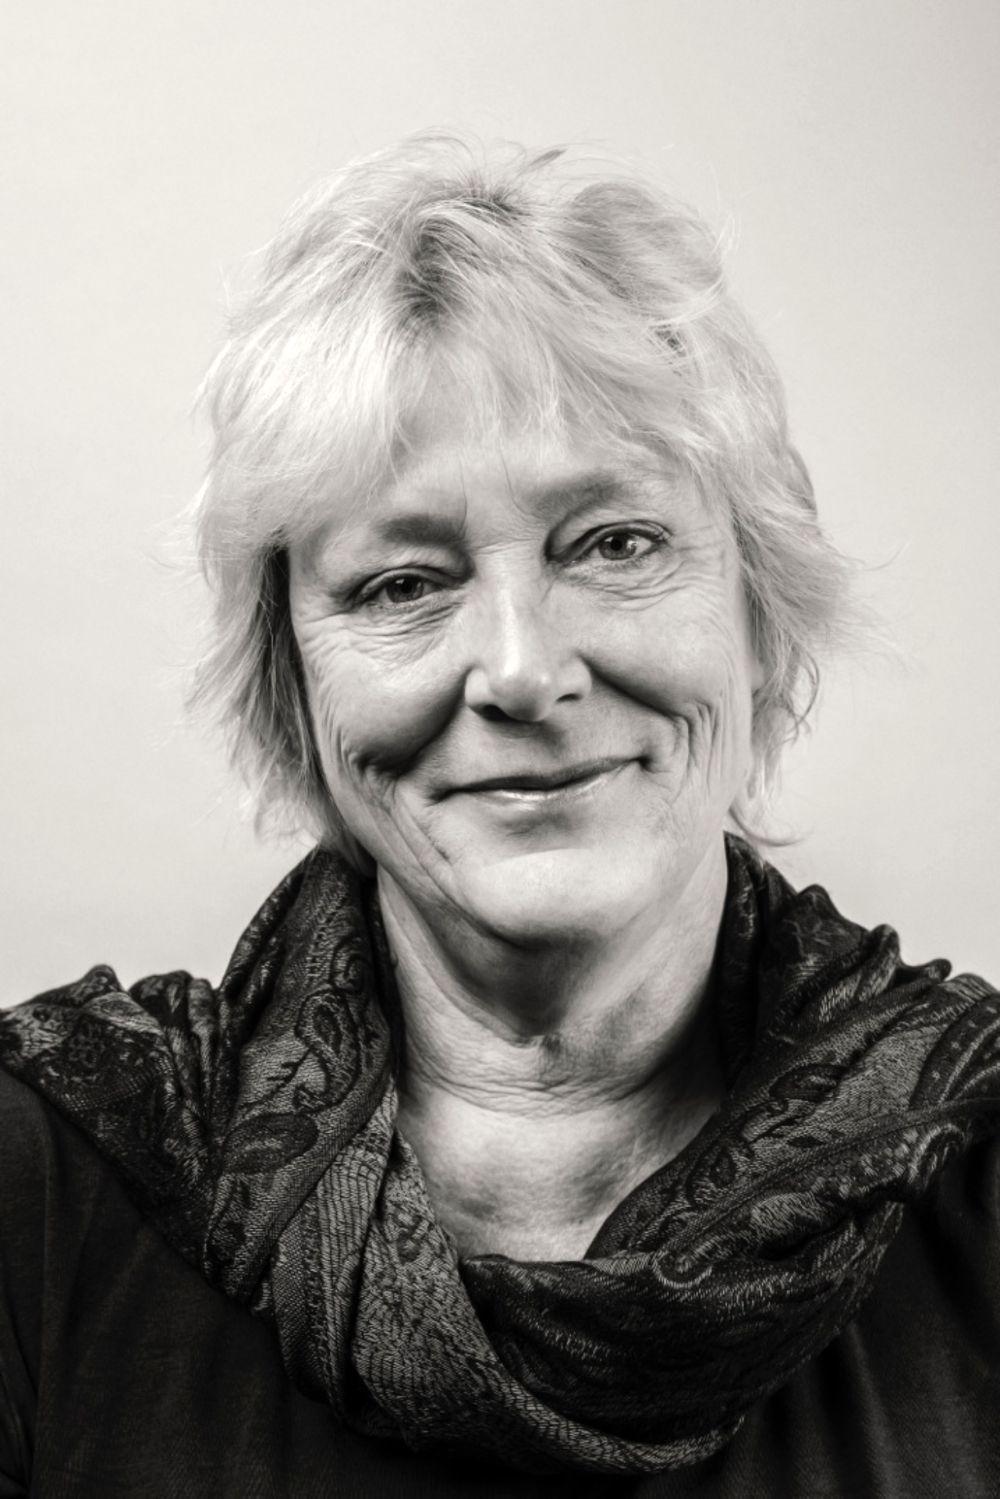 Linda Polman te gast in Literair Café over vluchtelingenbeleid